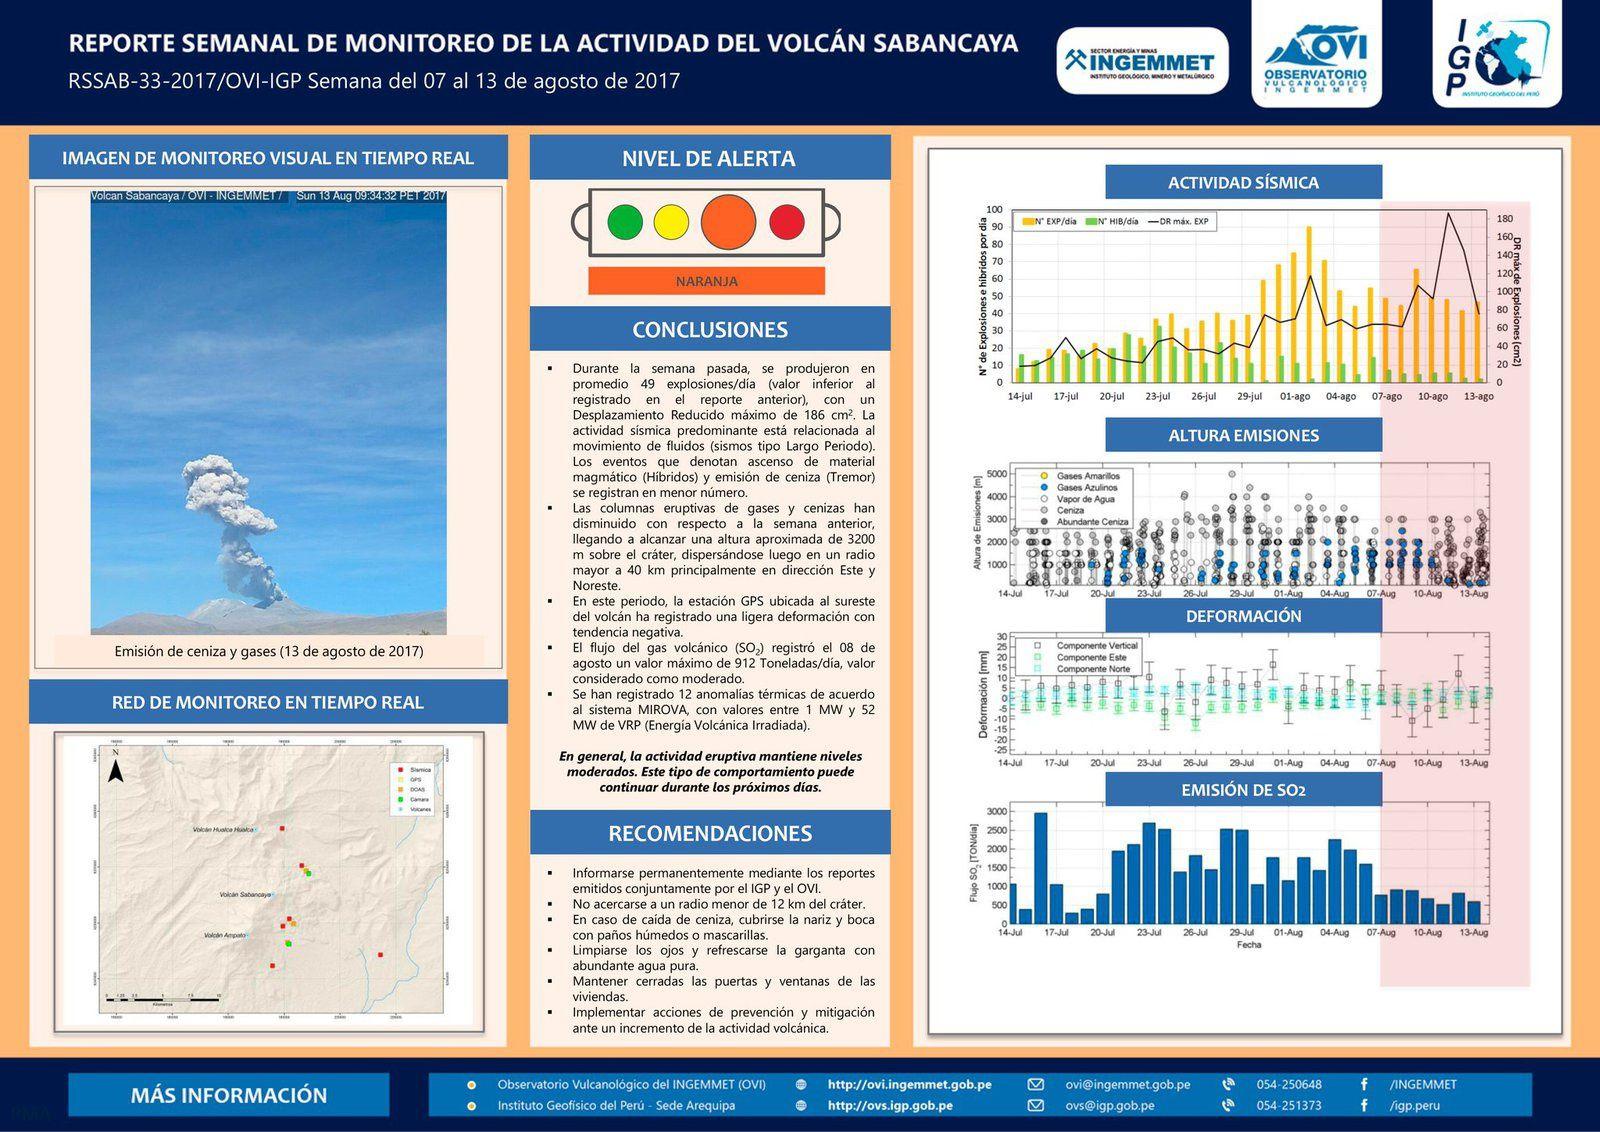 Sabancaya - summary table of activities between 7 and 13 August - Doc. IGP / OVI / Ingemmet